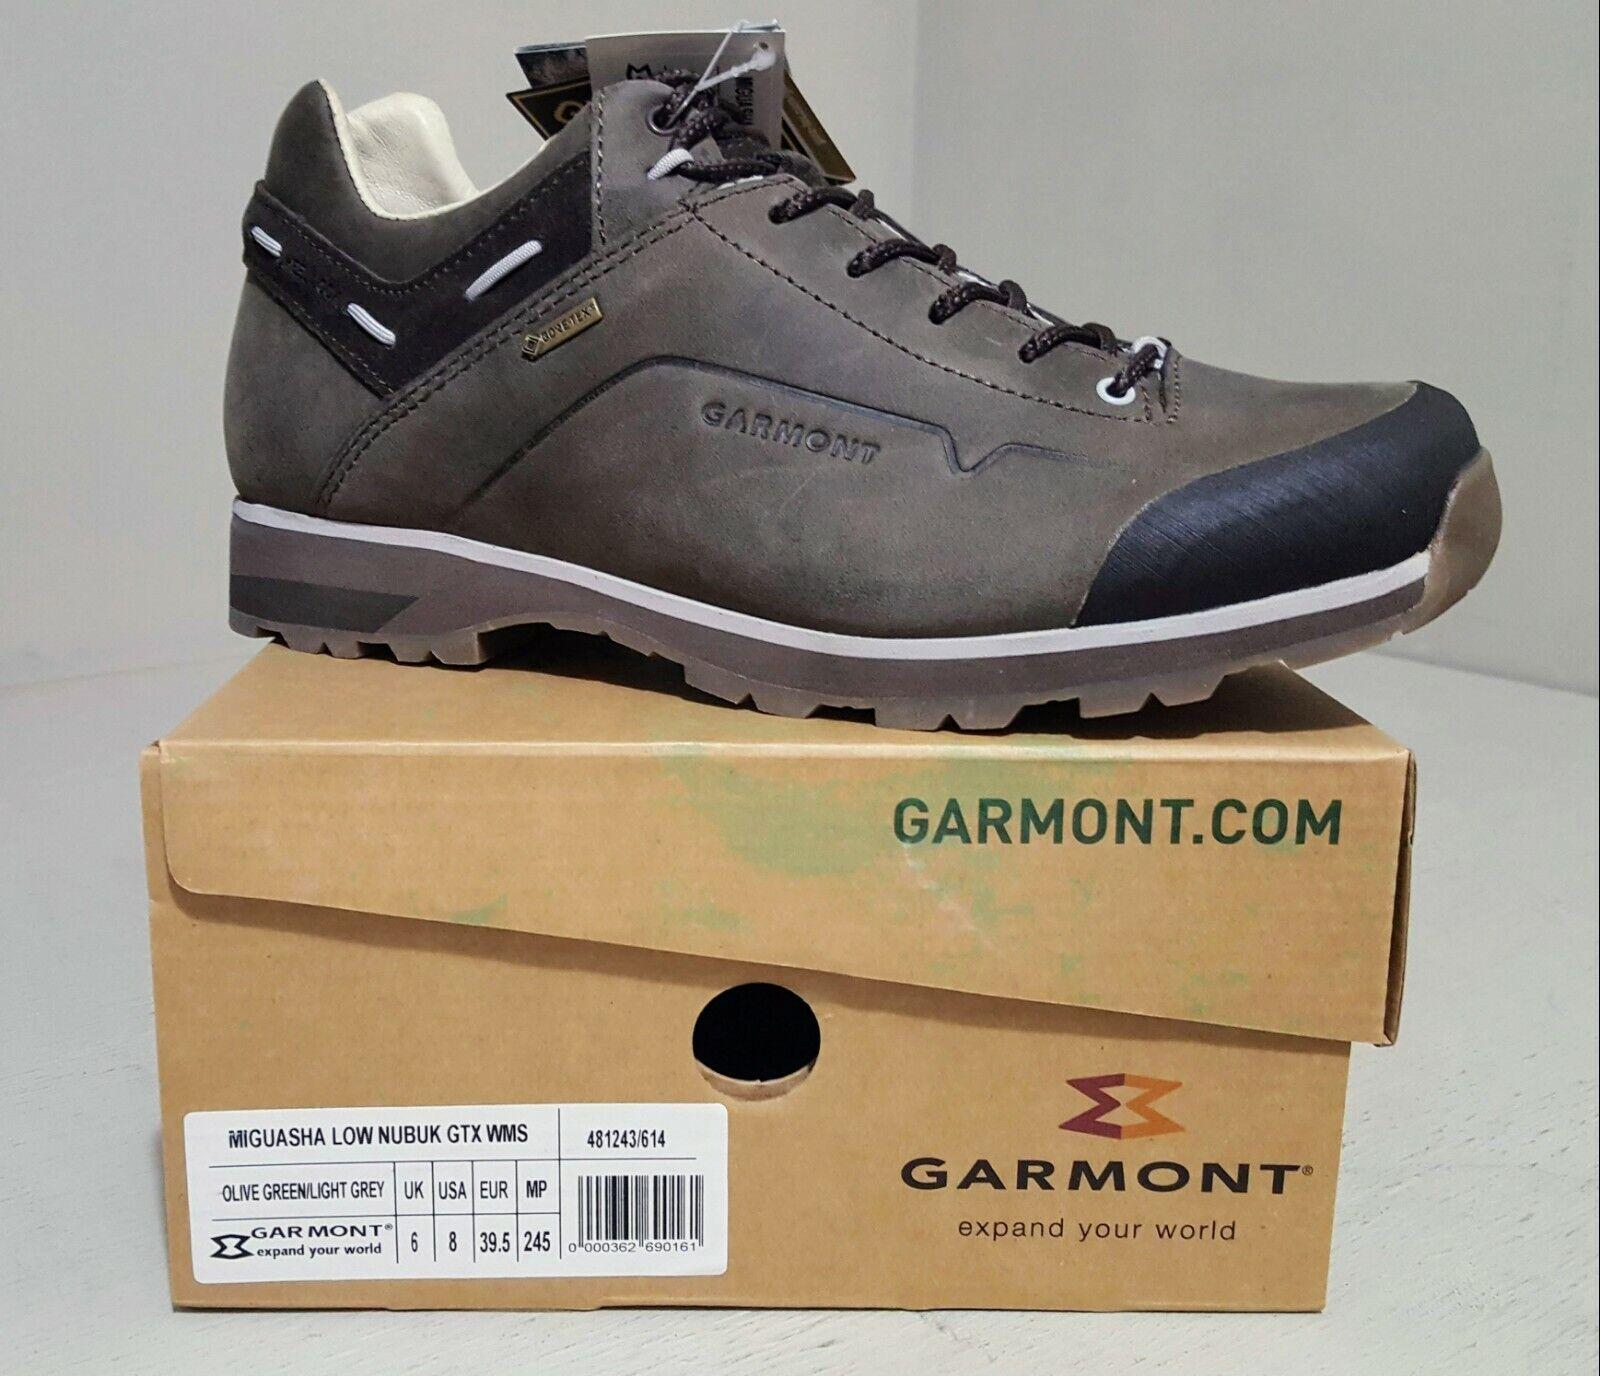 Garmont Miguasha Low Nubuk GTX femmes Hiking chaussures chaussures chaussures vert gris EU 39.5 Taille 8 NEW 4b14fe